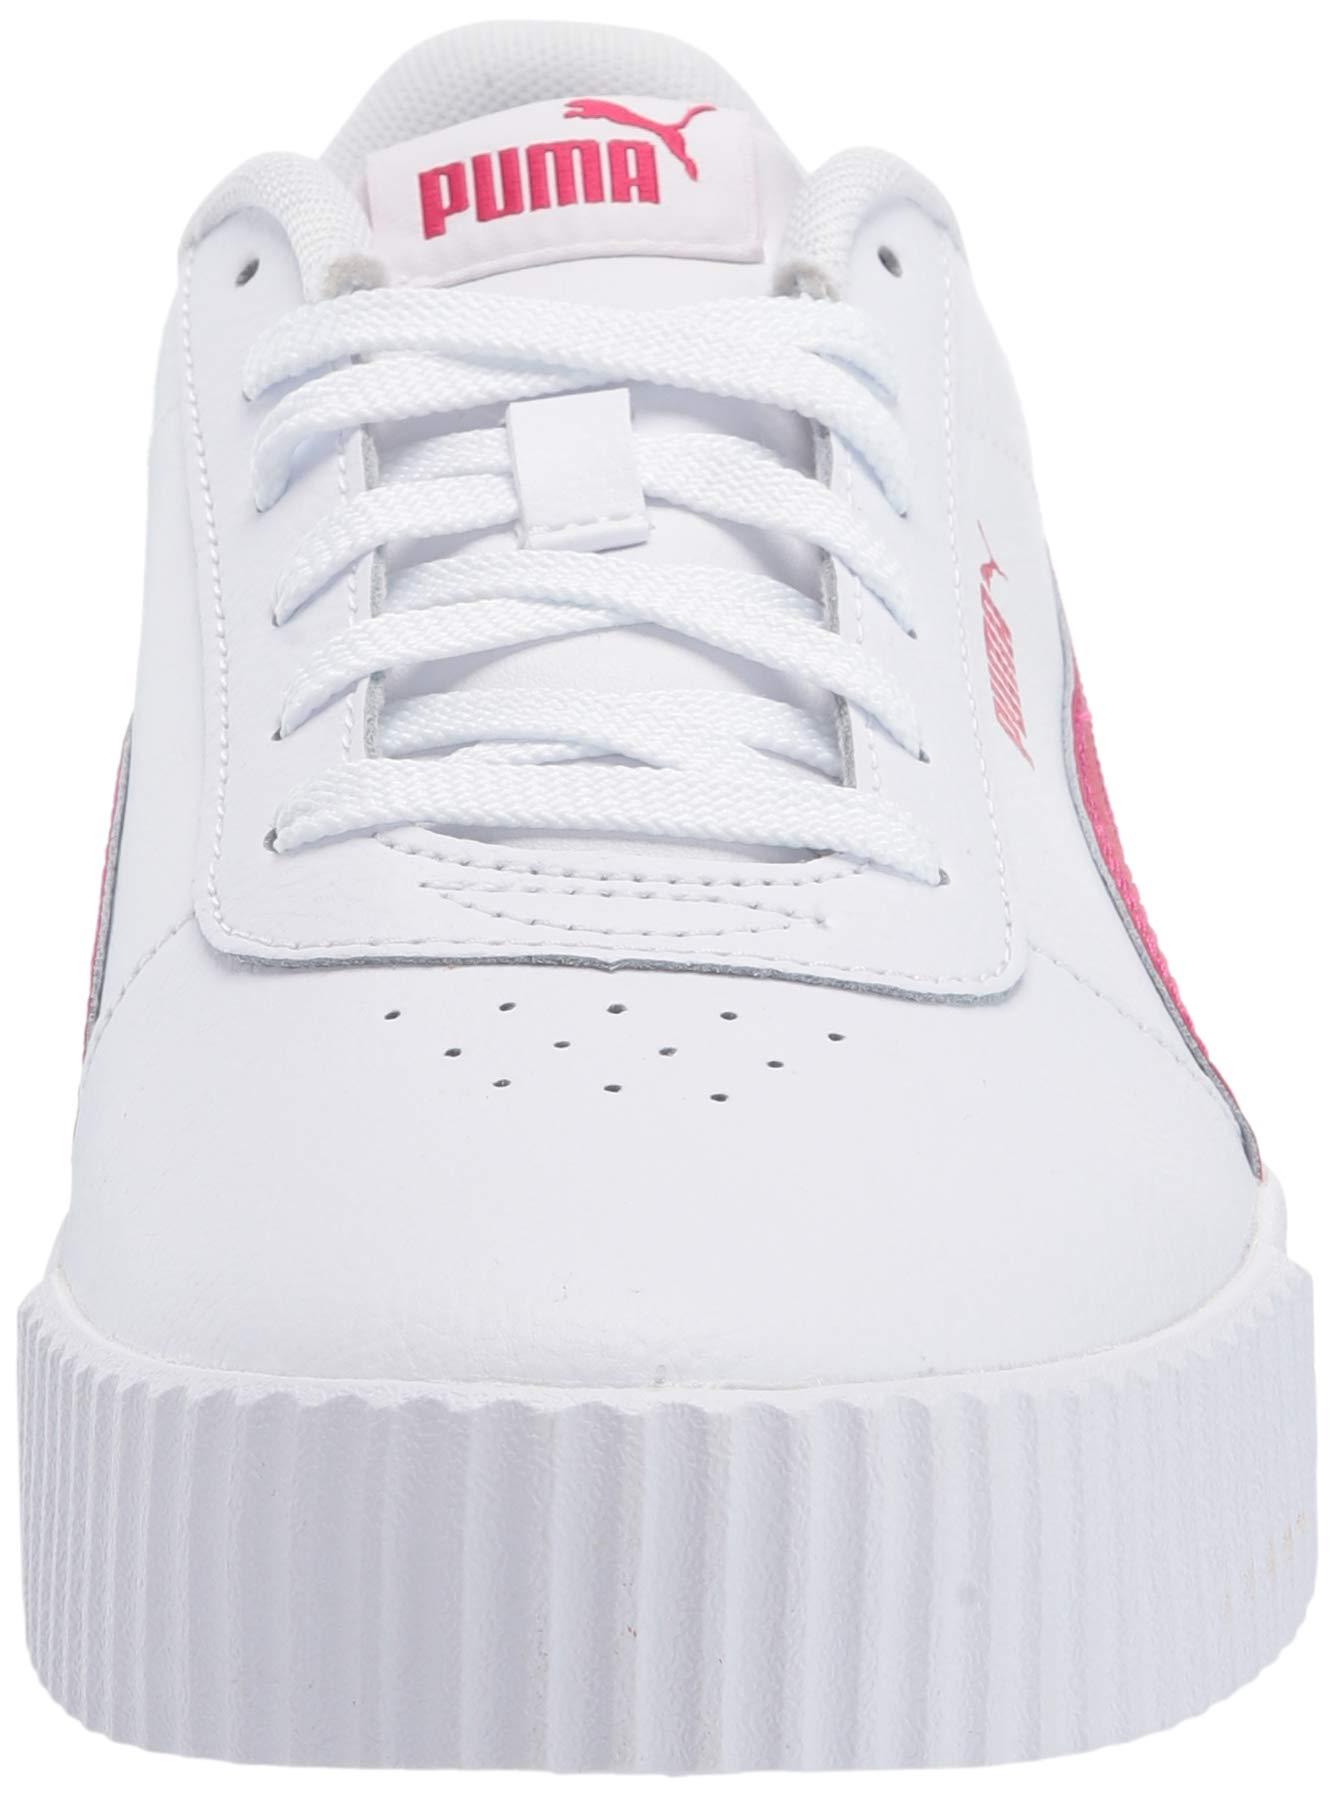 PUMA Women's Carina Sneaker, Whitebright Rose-Bright Rose, 5.5 M US